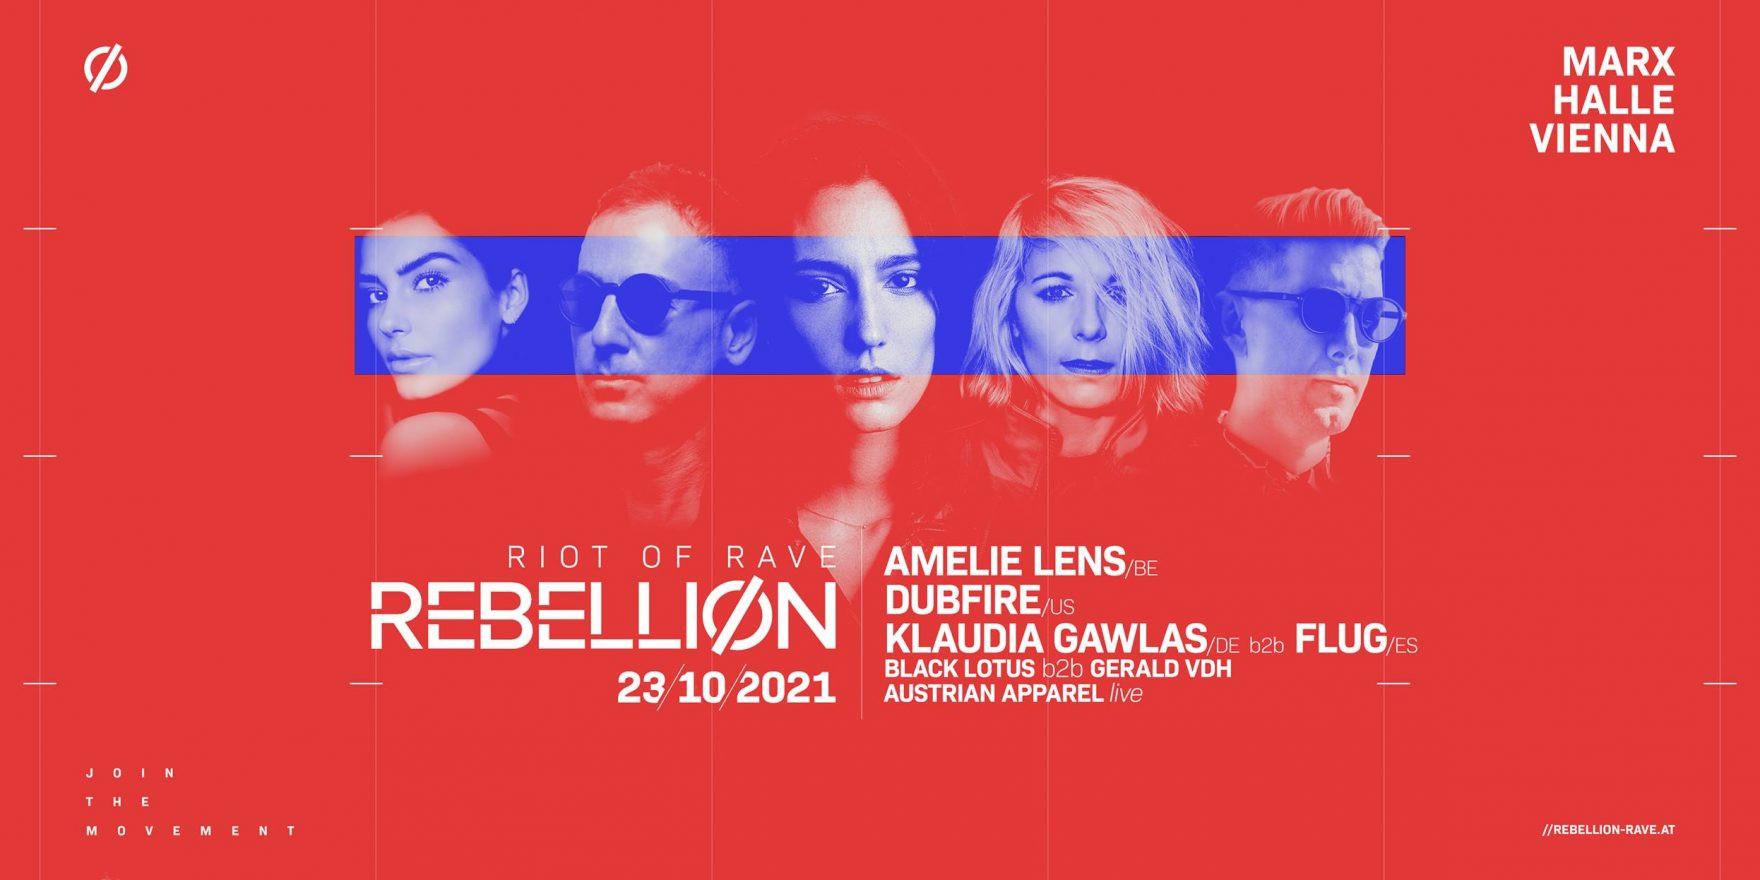 Rebelliøn - Riot of Rave